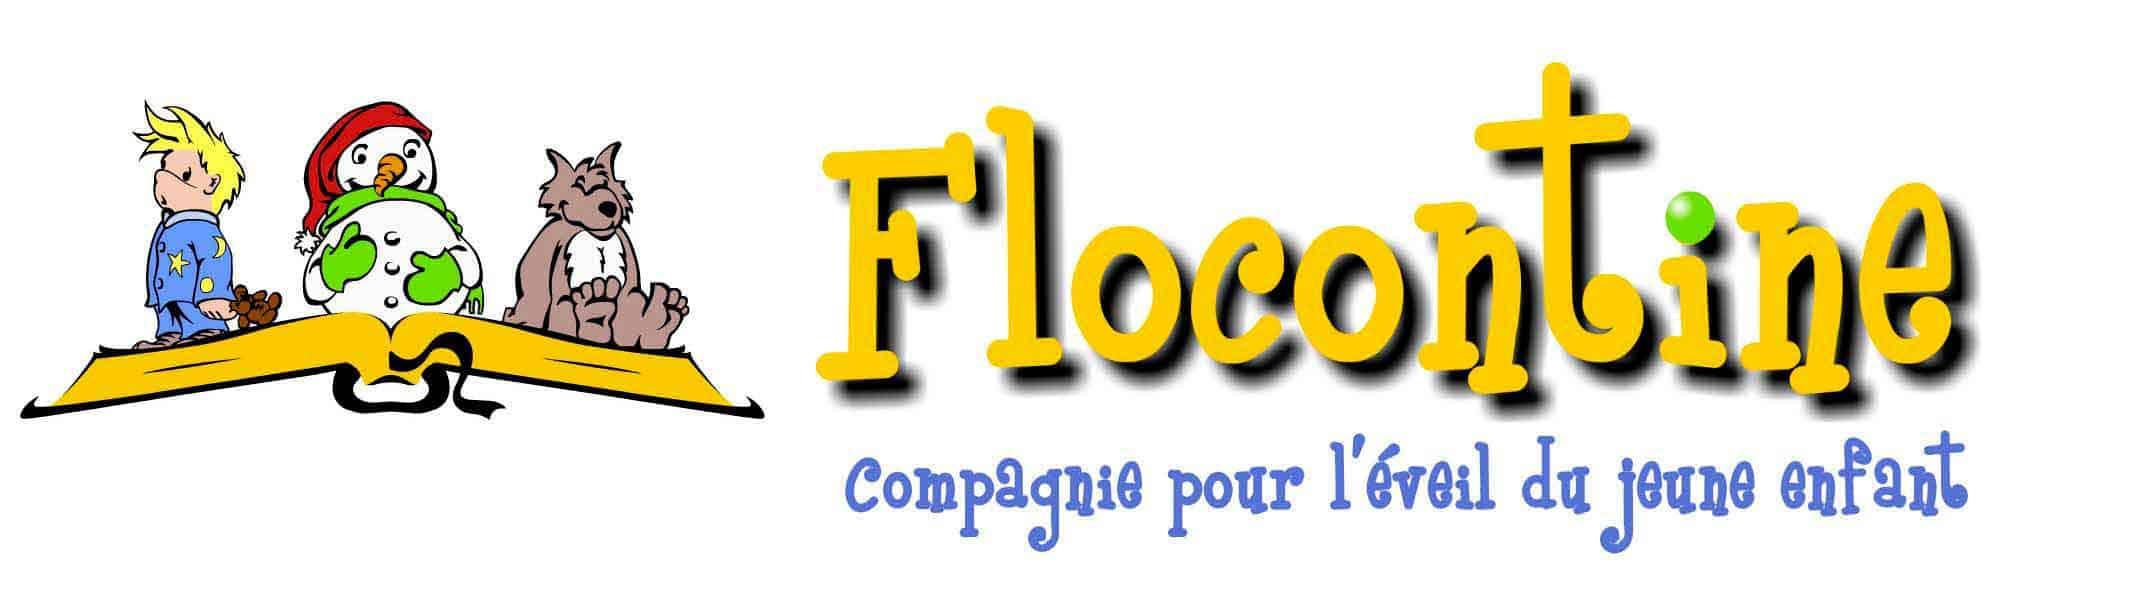 Flocontine